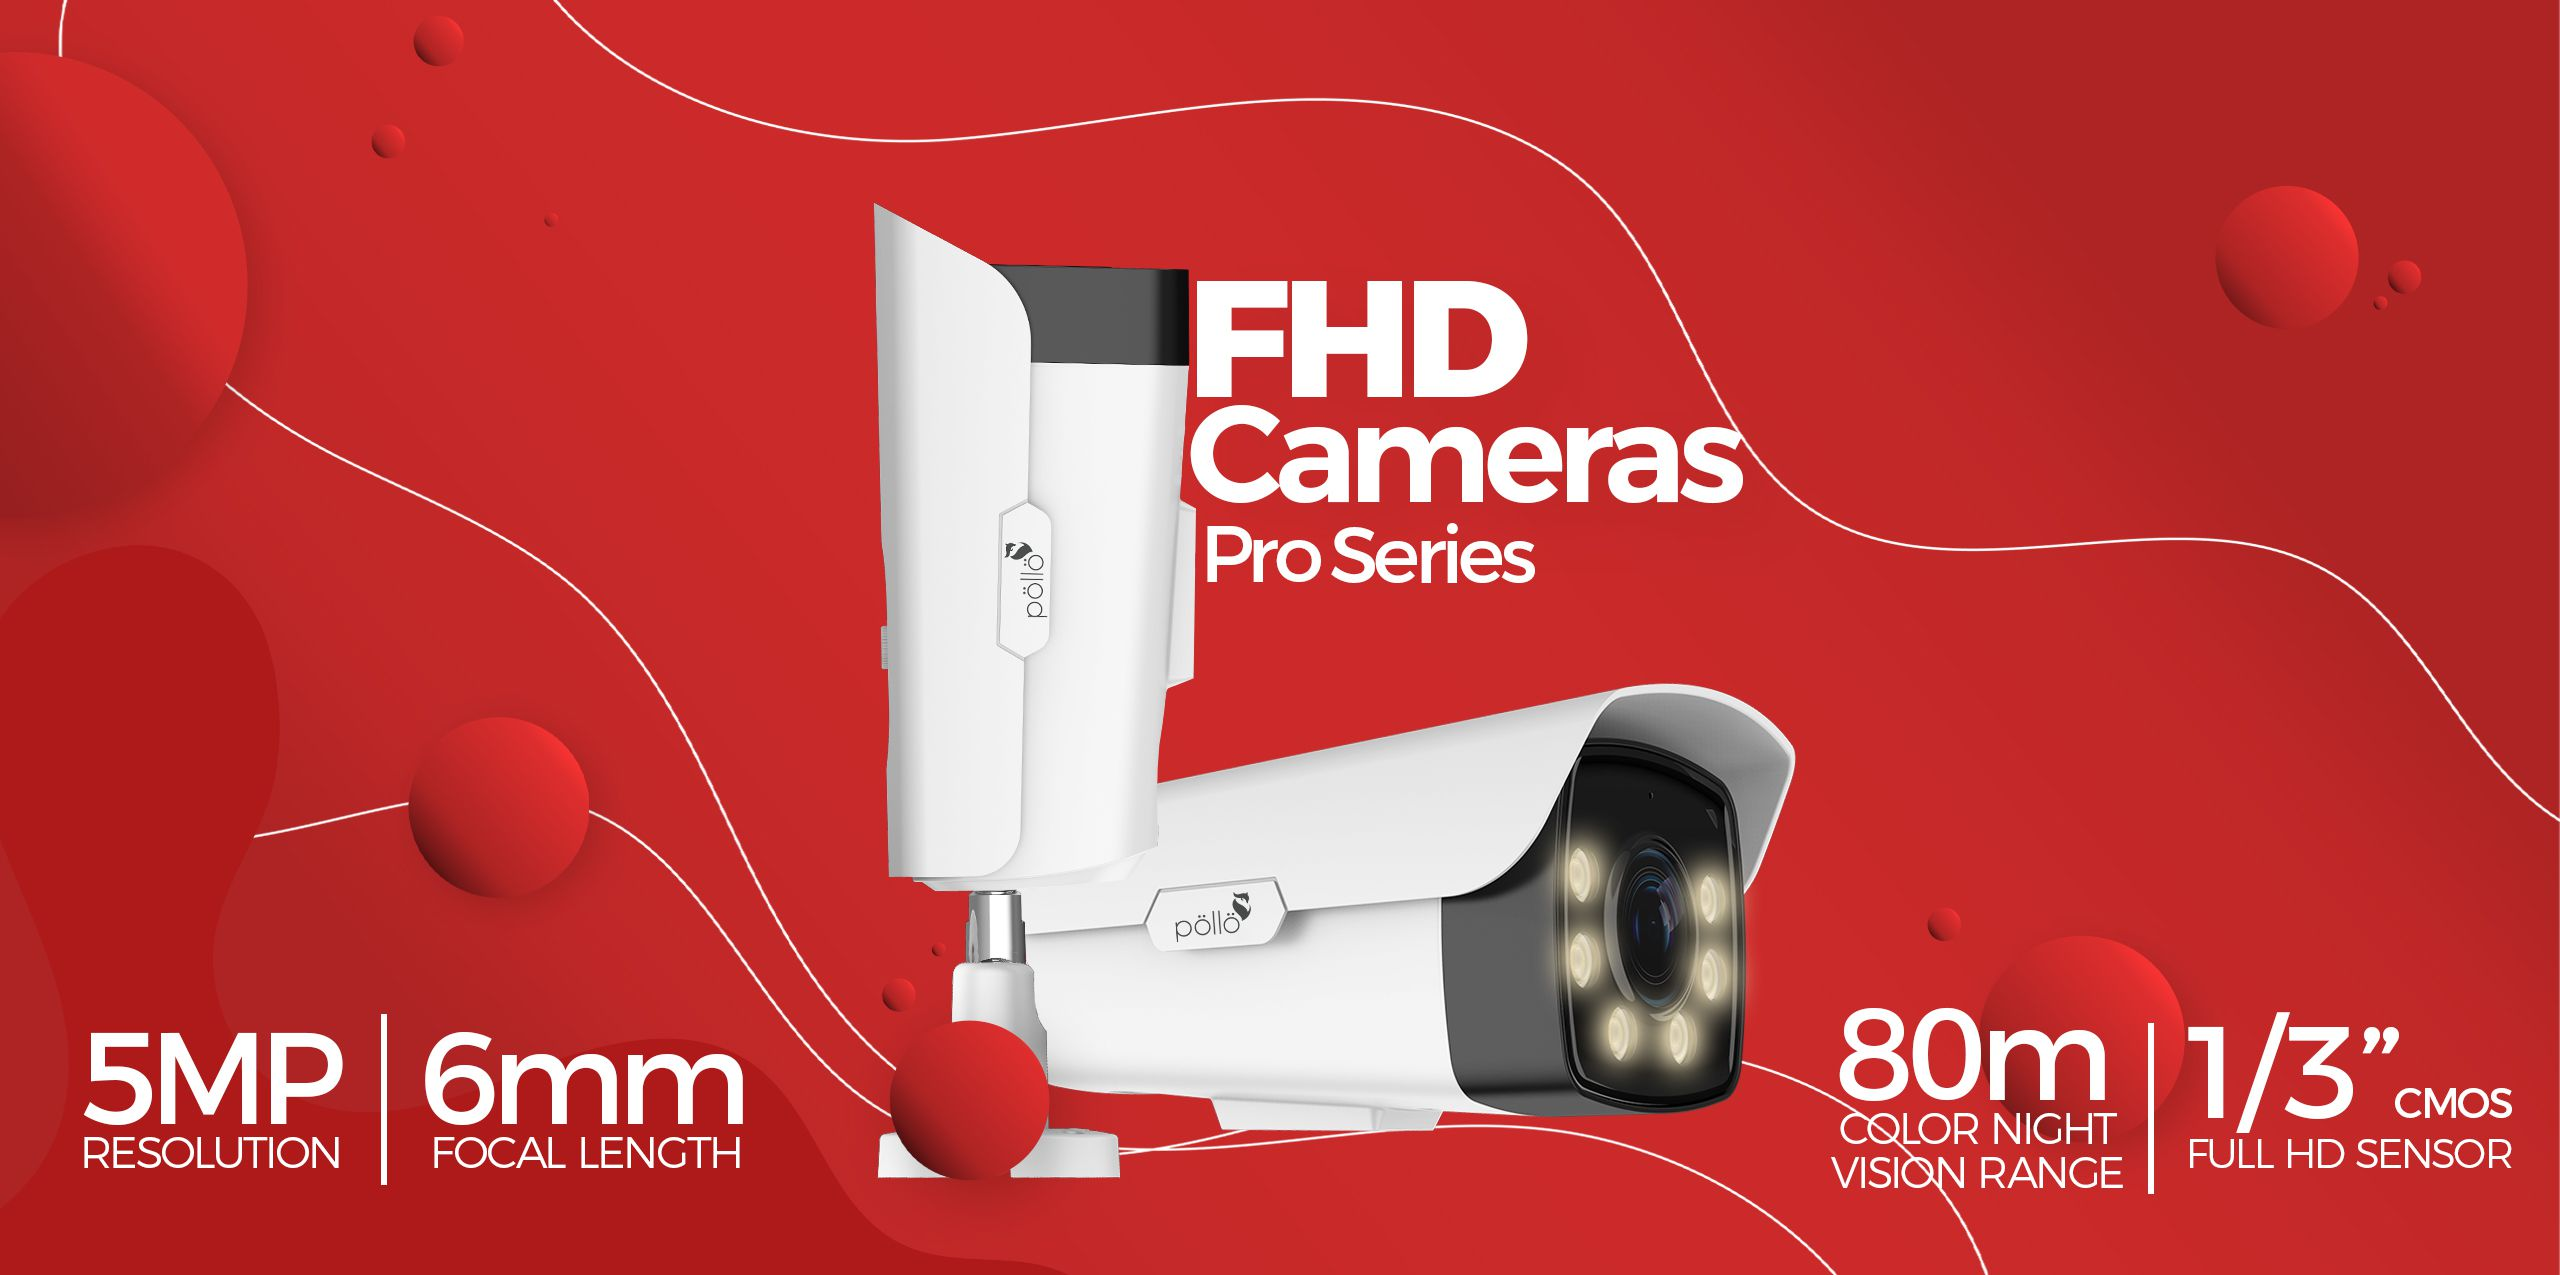 FHD Cameras